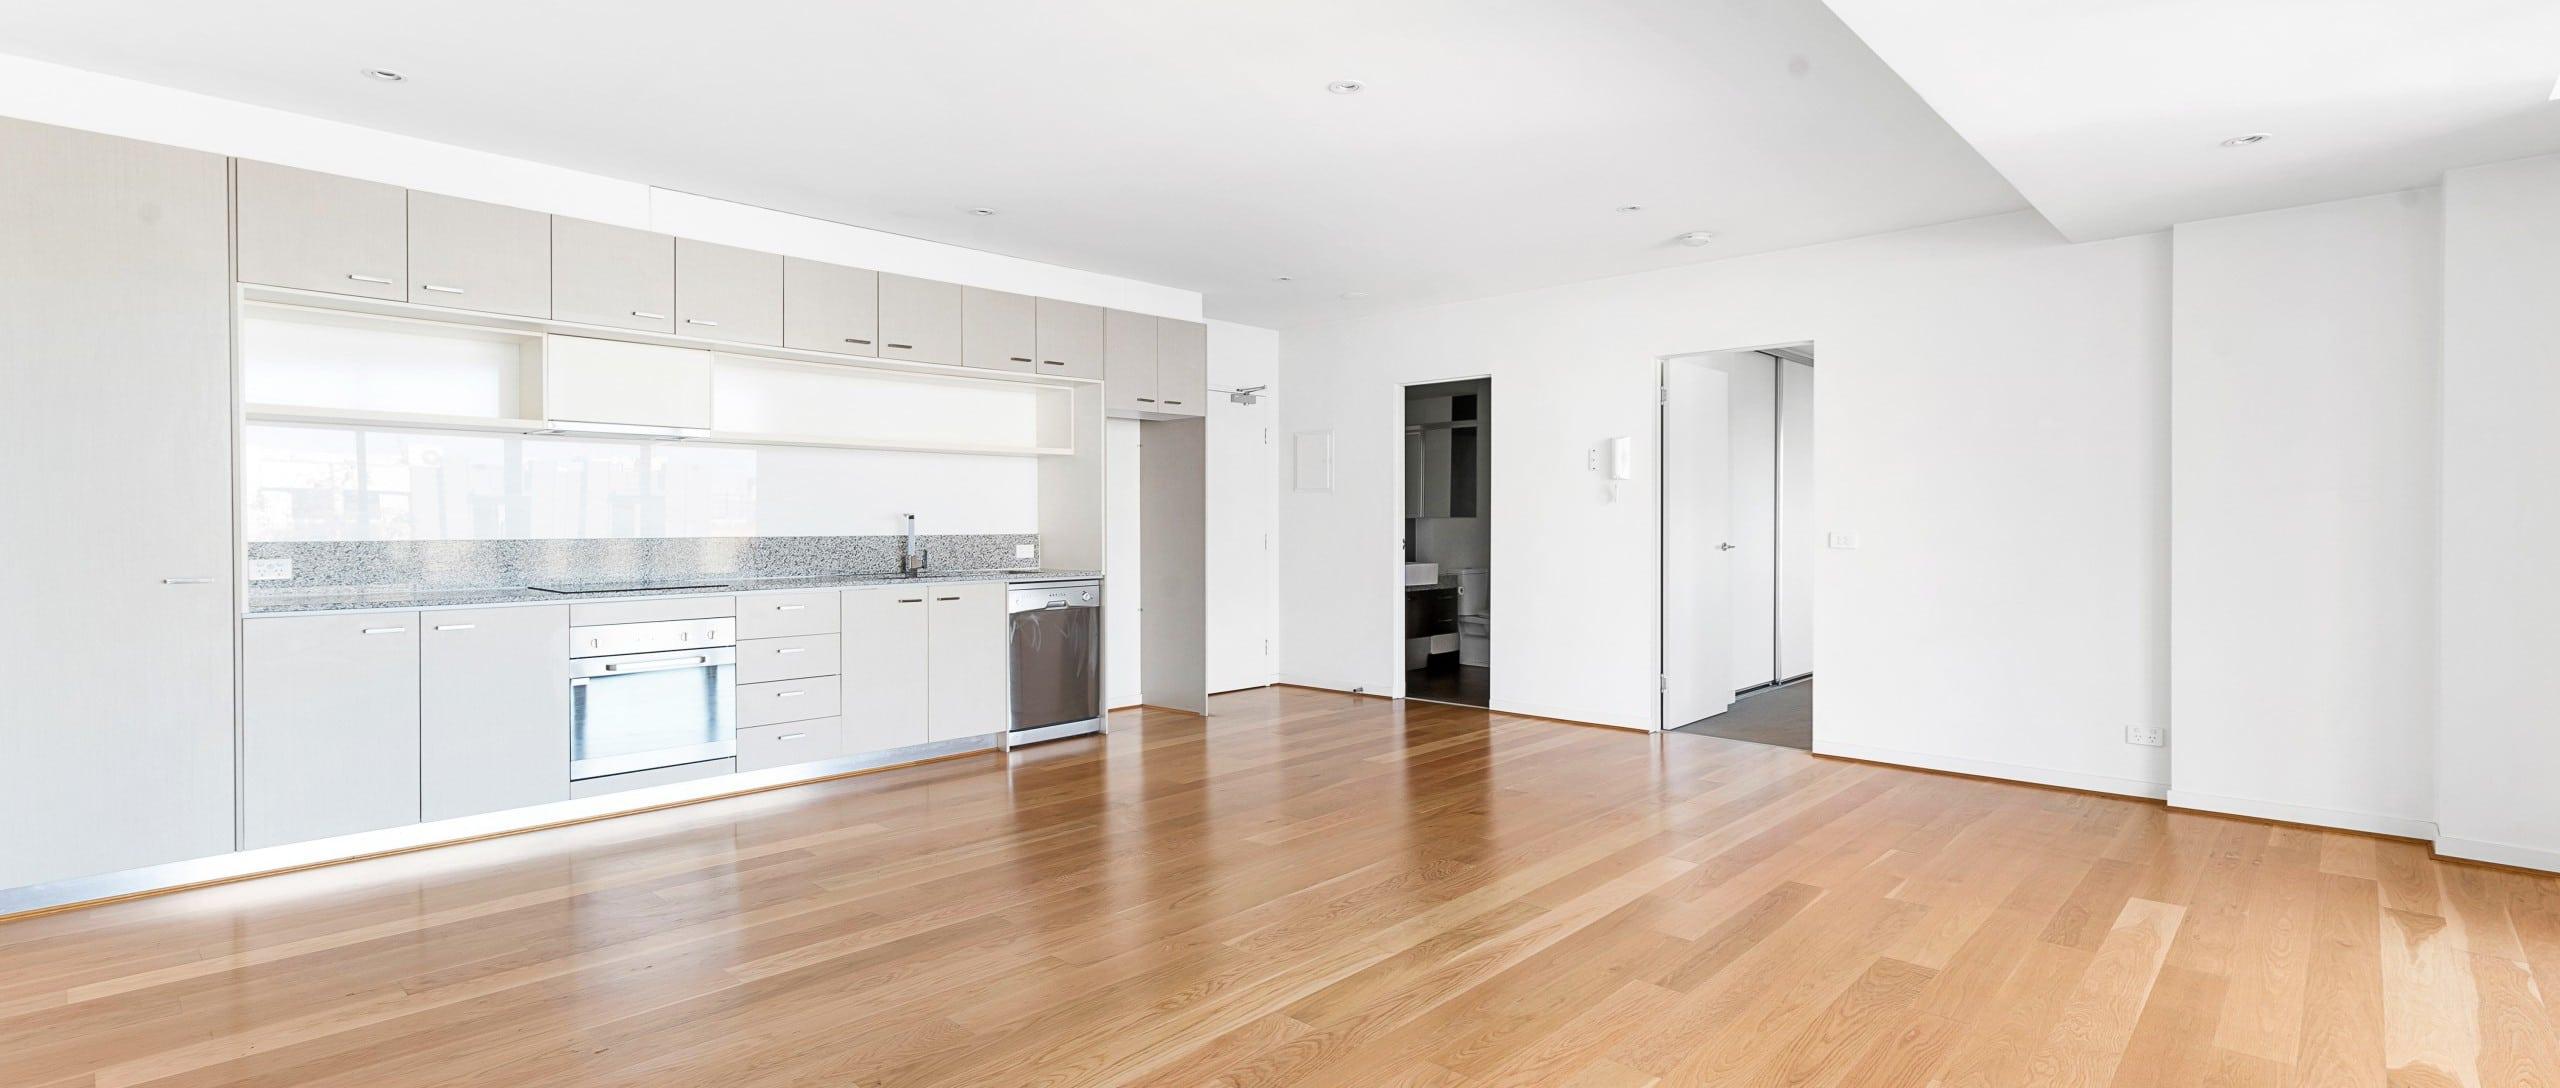 Immobilienmarketing -